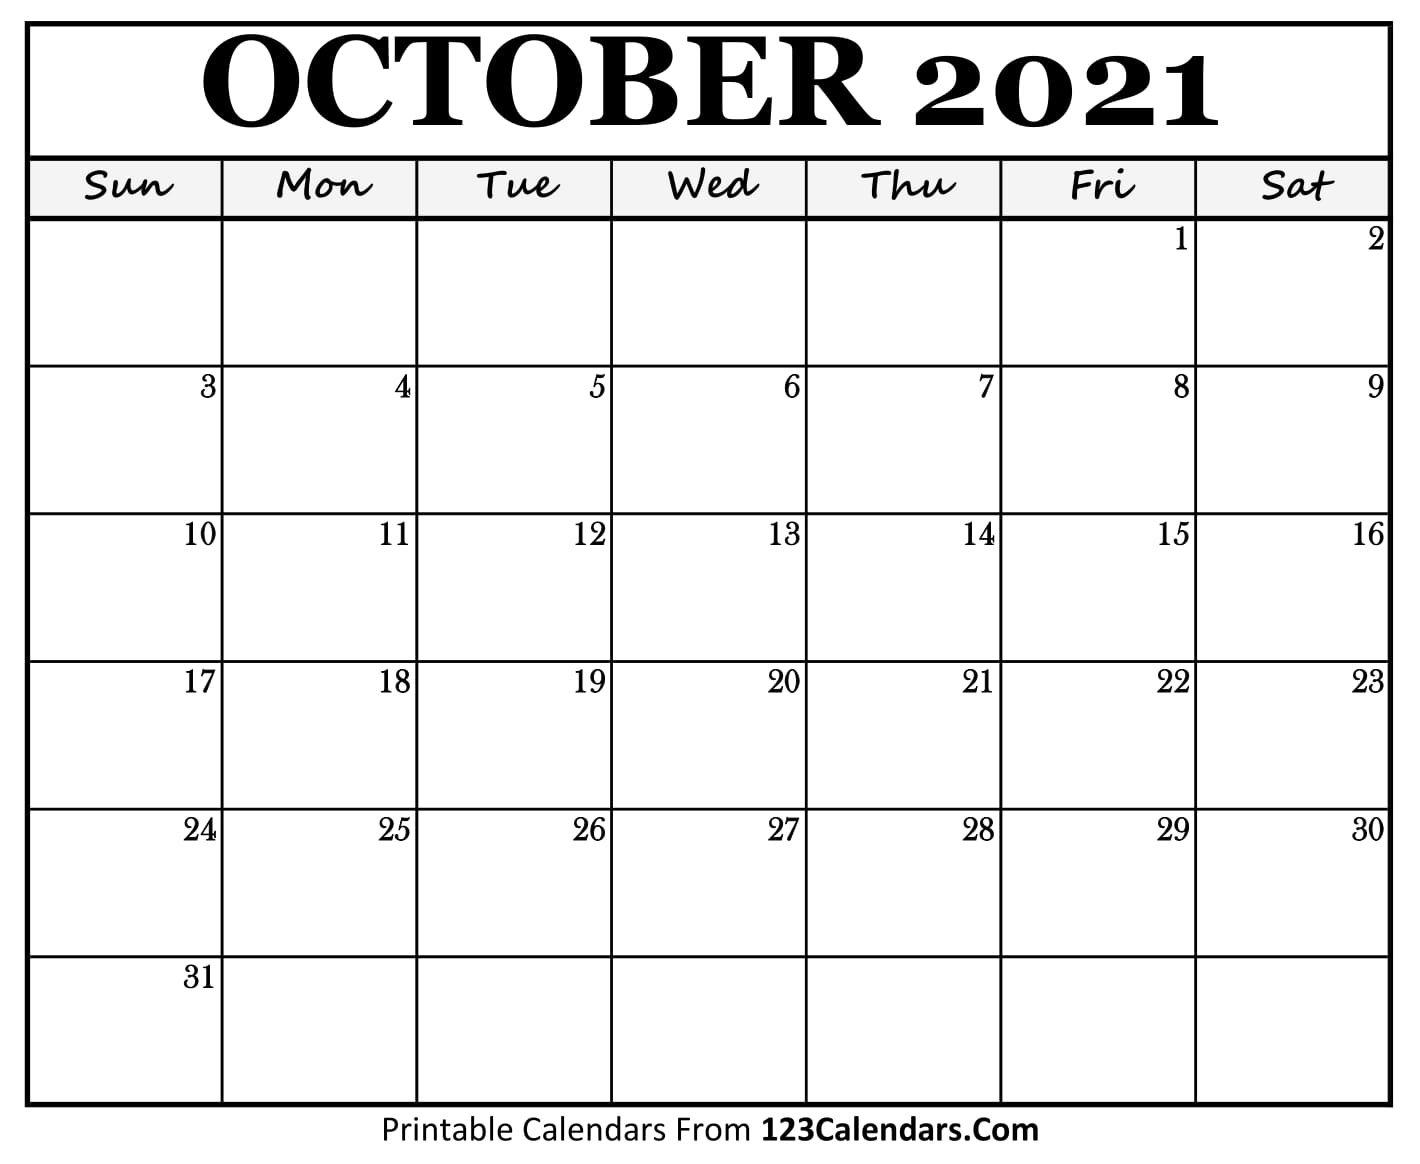 Printable October 2021 Calendar Templates | 123Calendars with Calendar 2021 Brunei For Print Photo